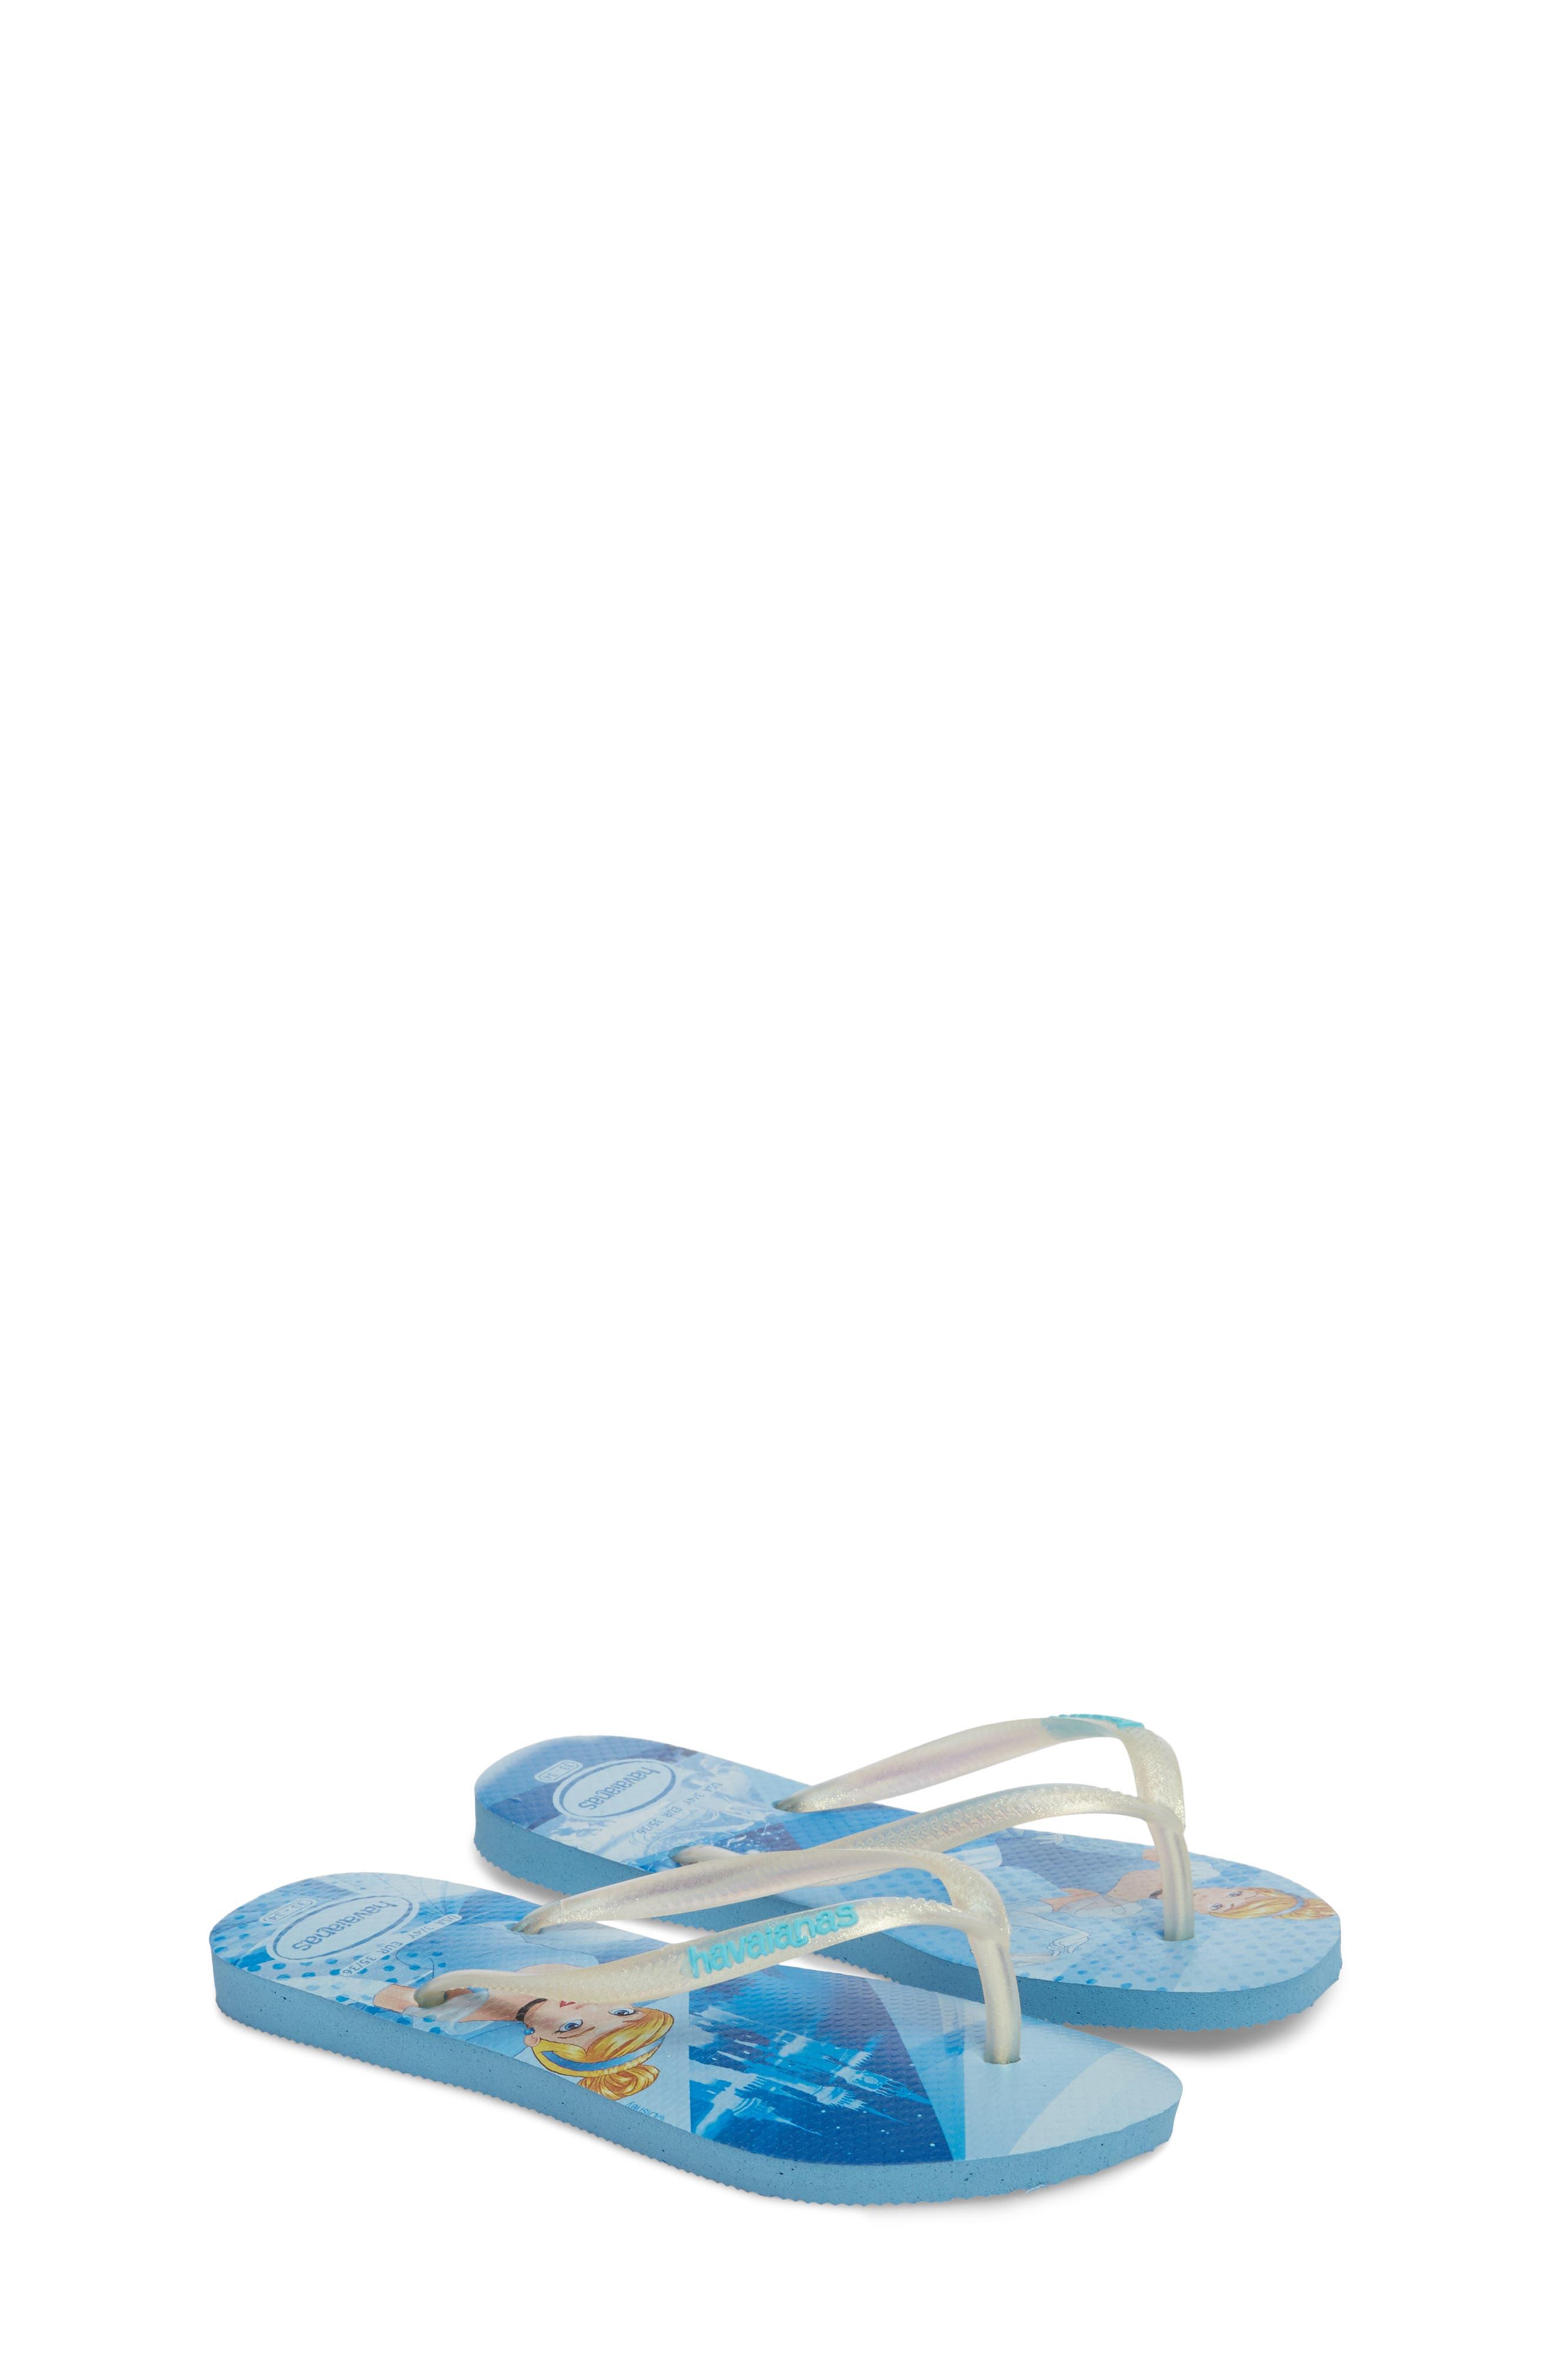 'Disney Princess' Flip Flops,                             Alternate thumbnail 3, color,                             Blue Splash